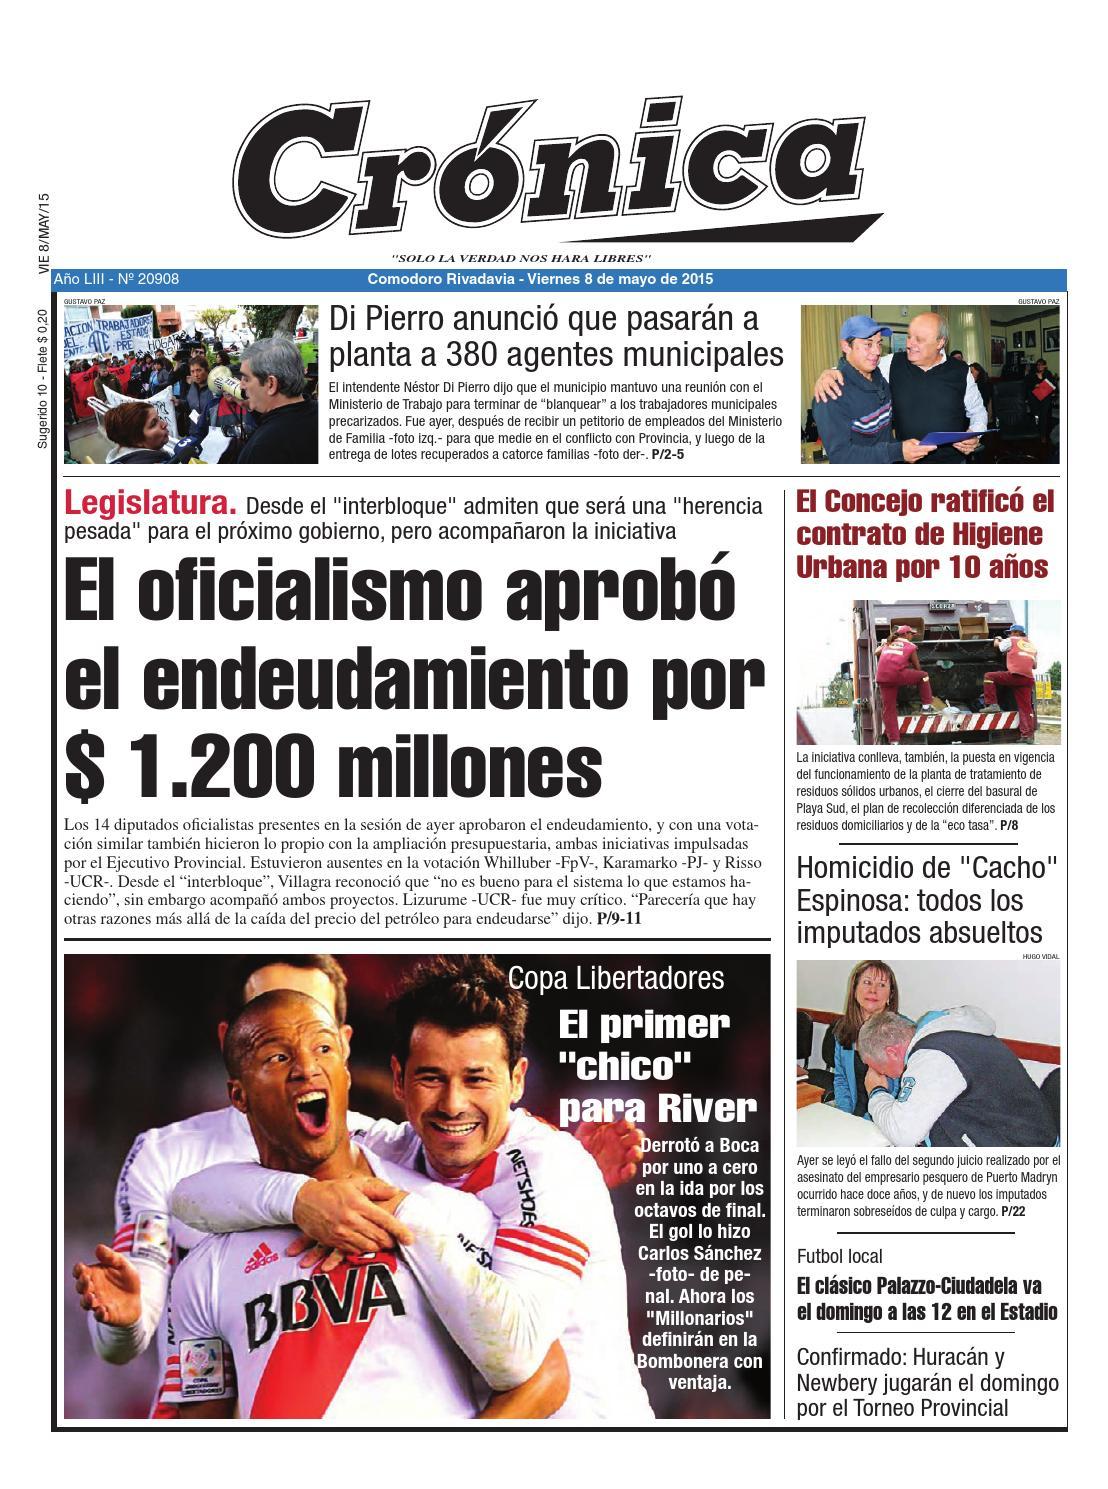 7a59ae84a07662b7d968a1d784625d6d by Diario Crónica - issuu 27733bf08a